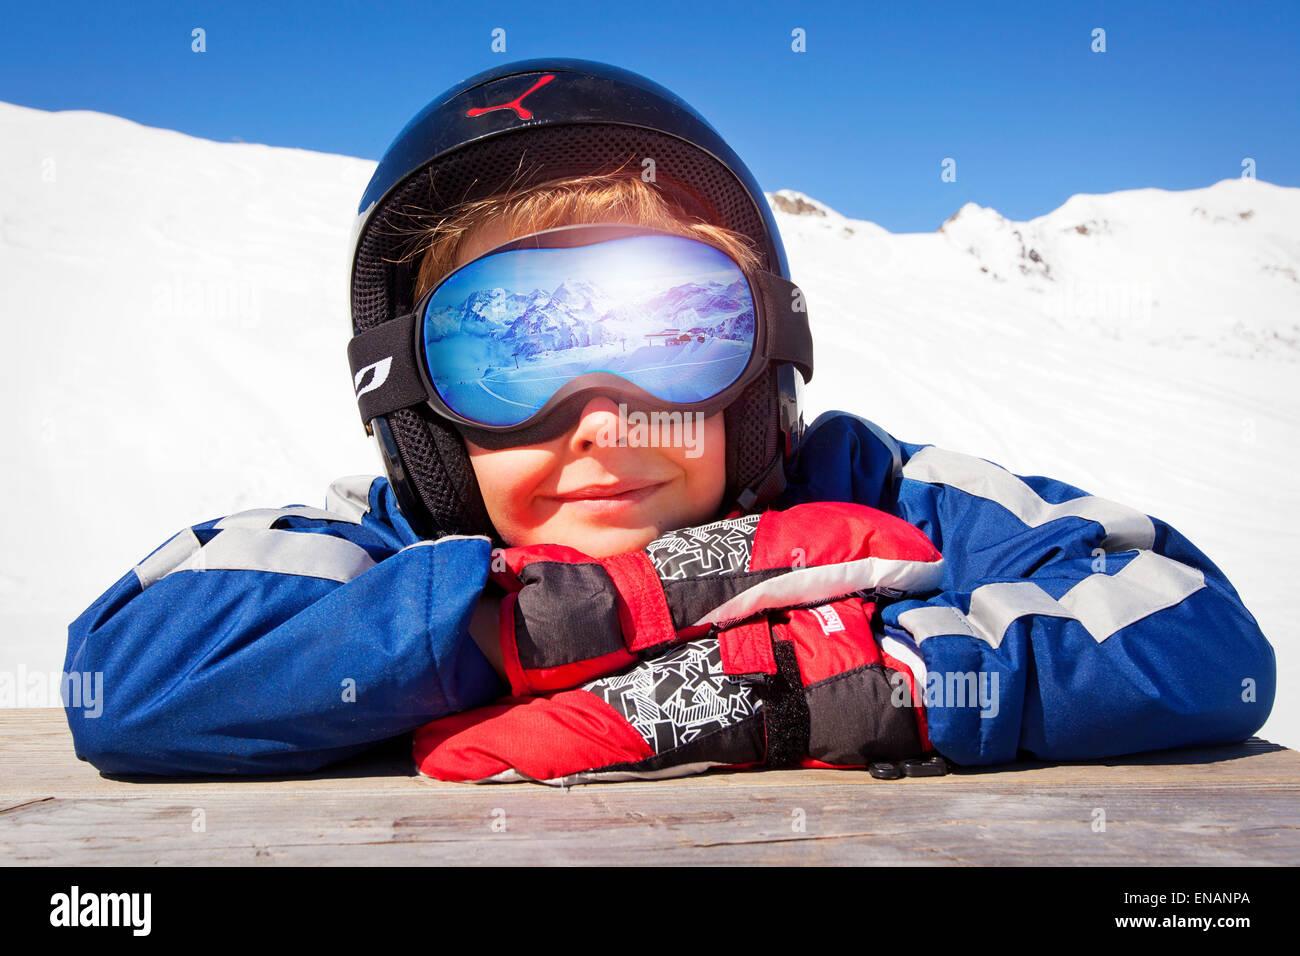 Poster boy maschere da sci vacanza Immagini Stock